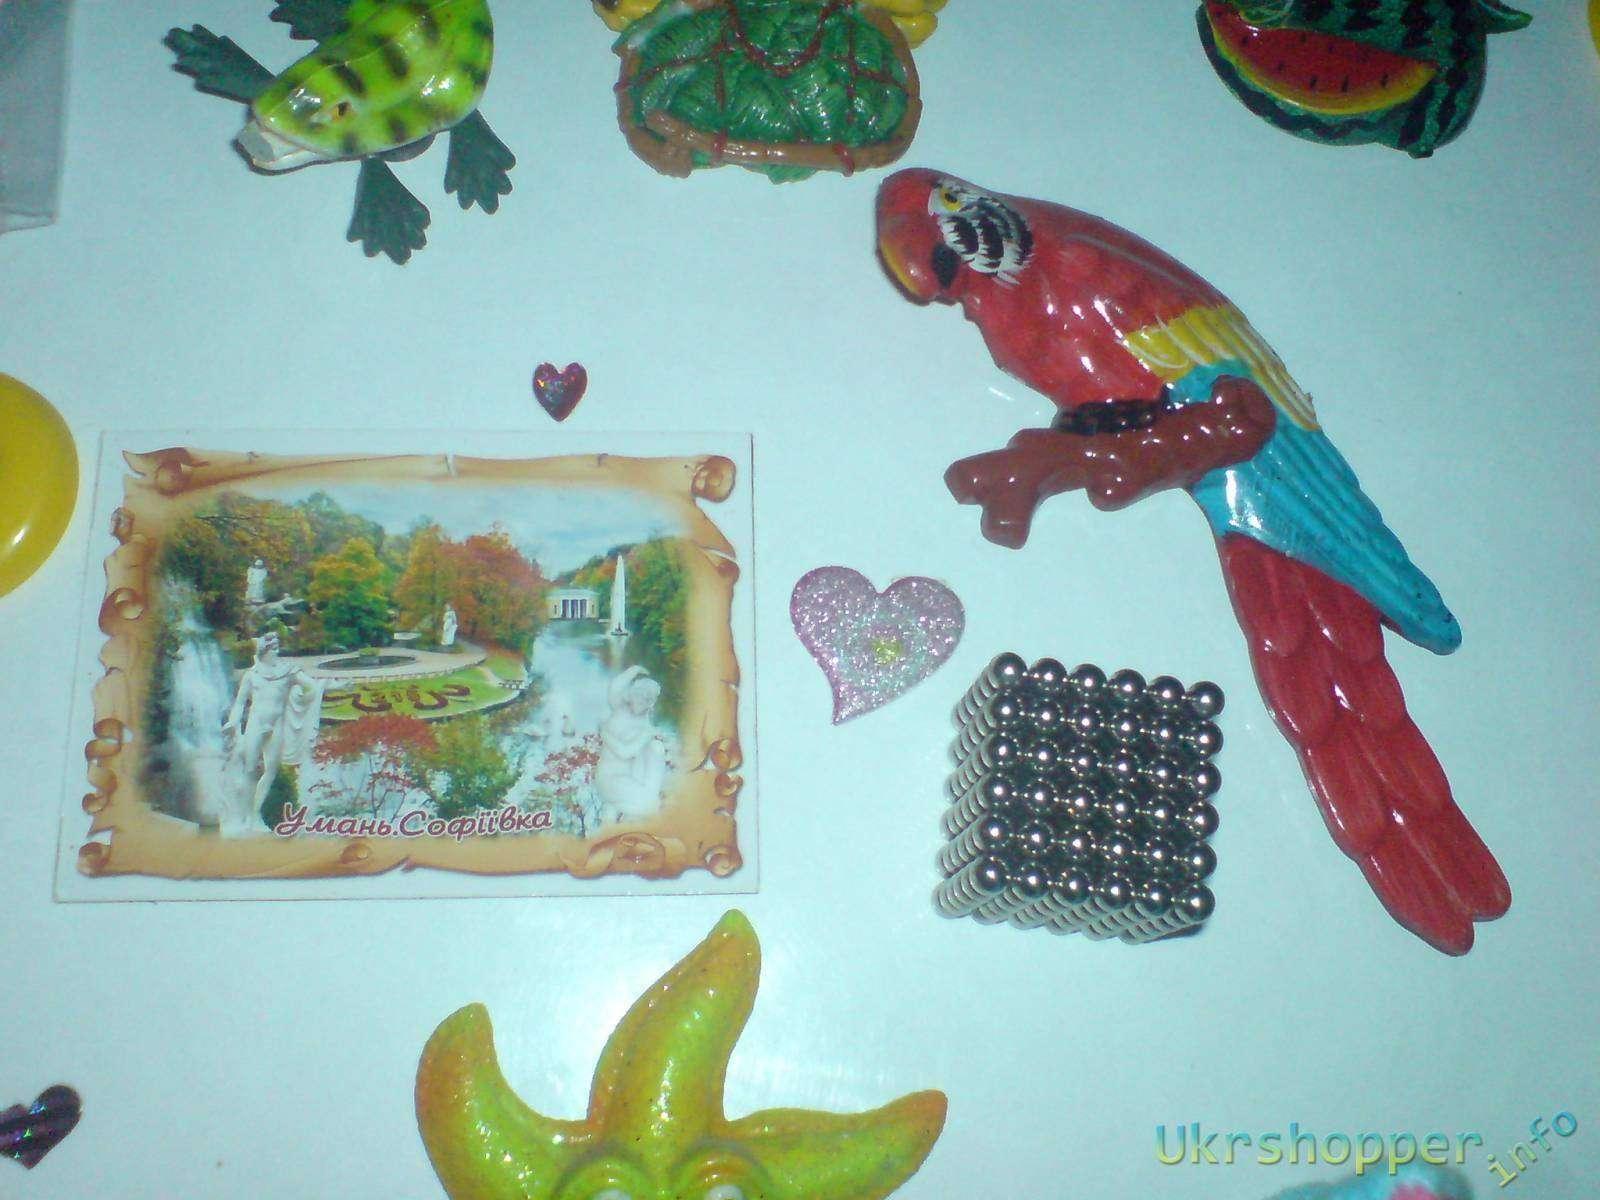 TinyDeal: 216 x 5mm Diameter Magic Magnet Magnetic DIY Balls Sphere Neodymium Cube Puzzle Toy - Baby Blue FMC-33966